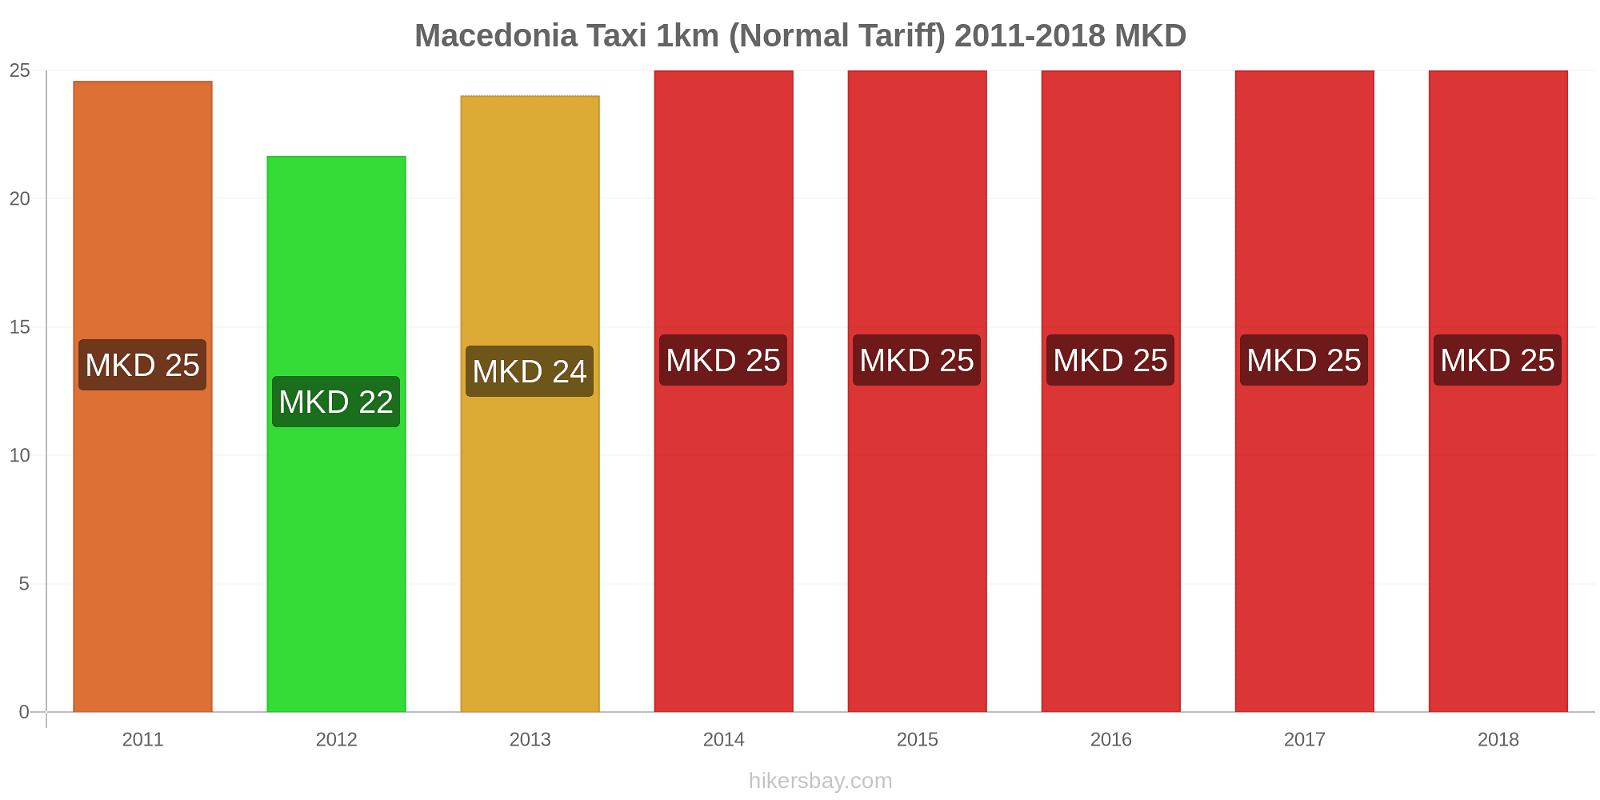 Macedonia price changes Taxi 1km (Normal Tariff) hikersbay.com